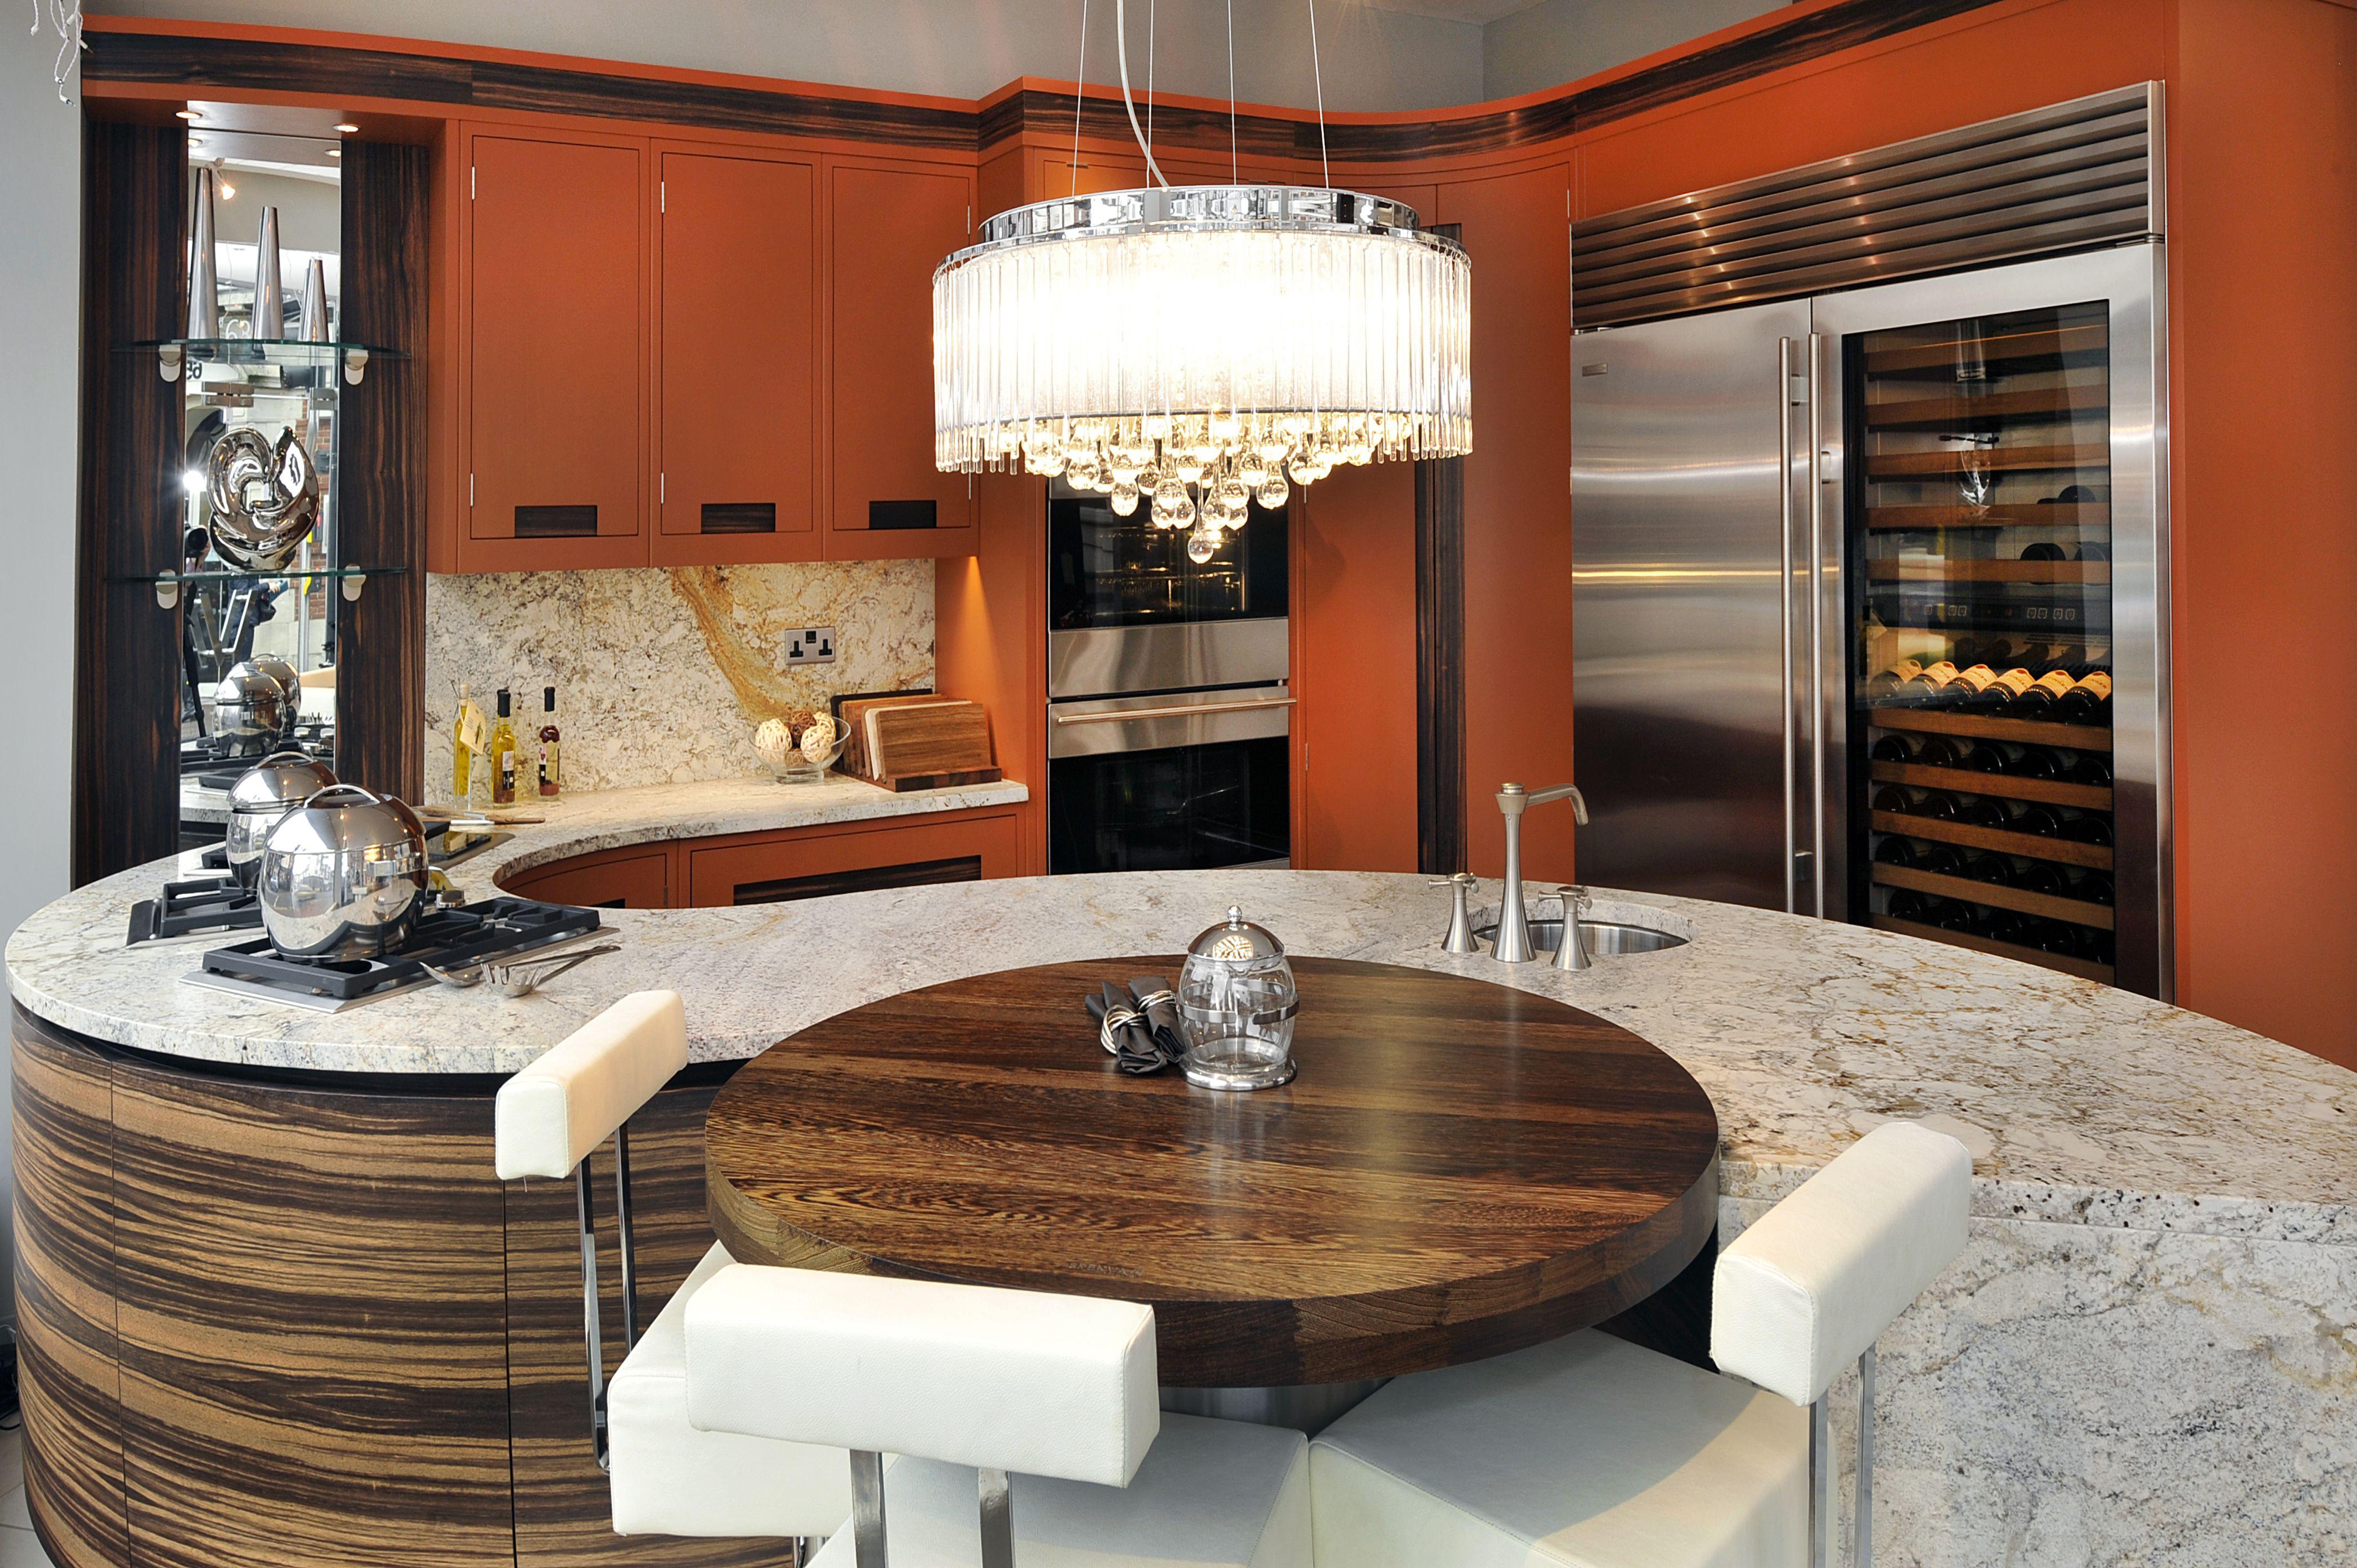 Gerrards Cross Kitchen Showroom. Curved kitchen island & bespoke ...